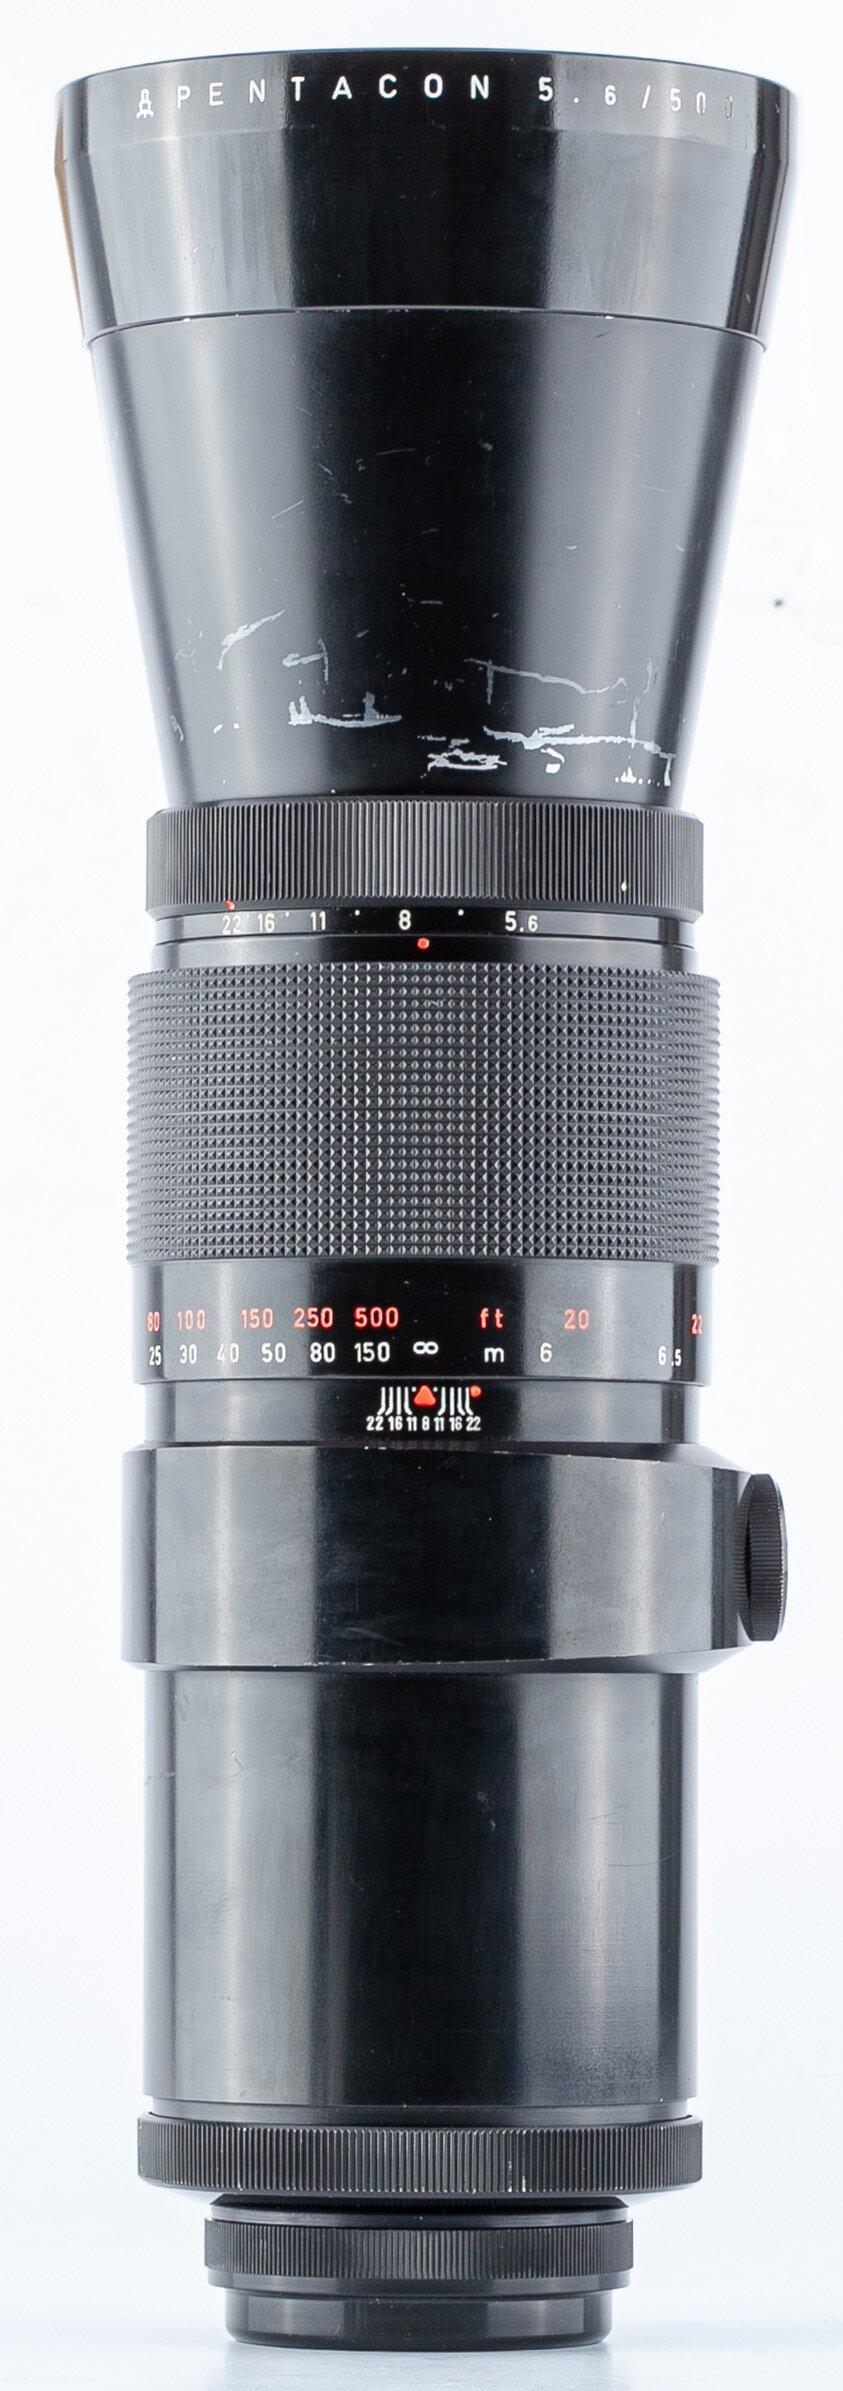 Pentacon 5,6/500mm MC Pentacon six